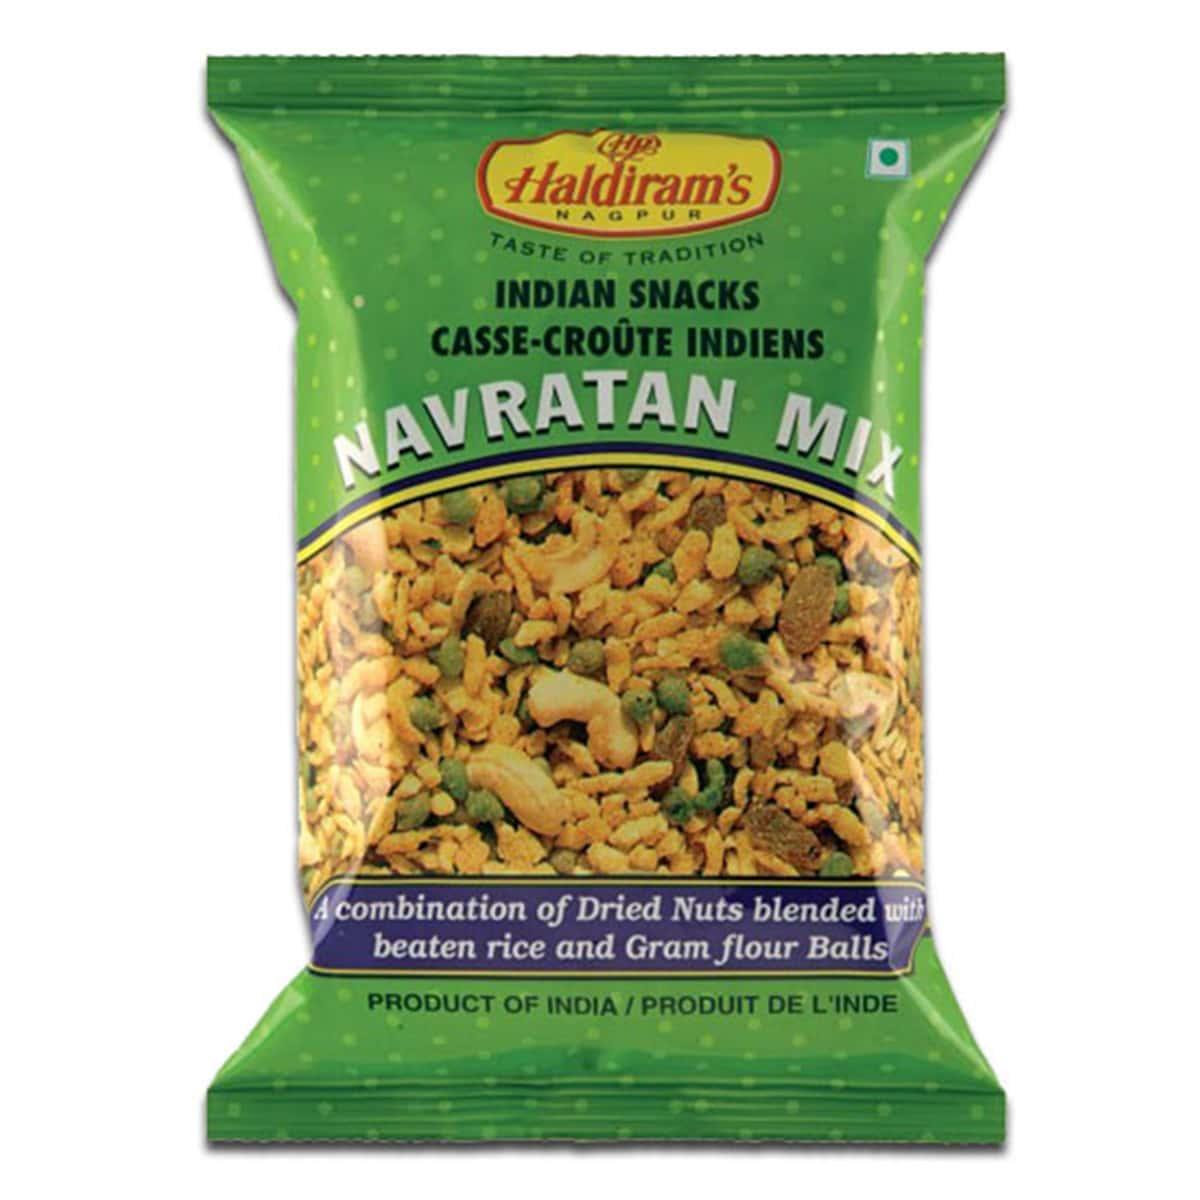 Buy Haldirams Navratan Mix - 150 gm